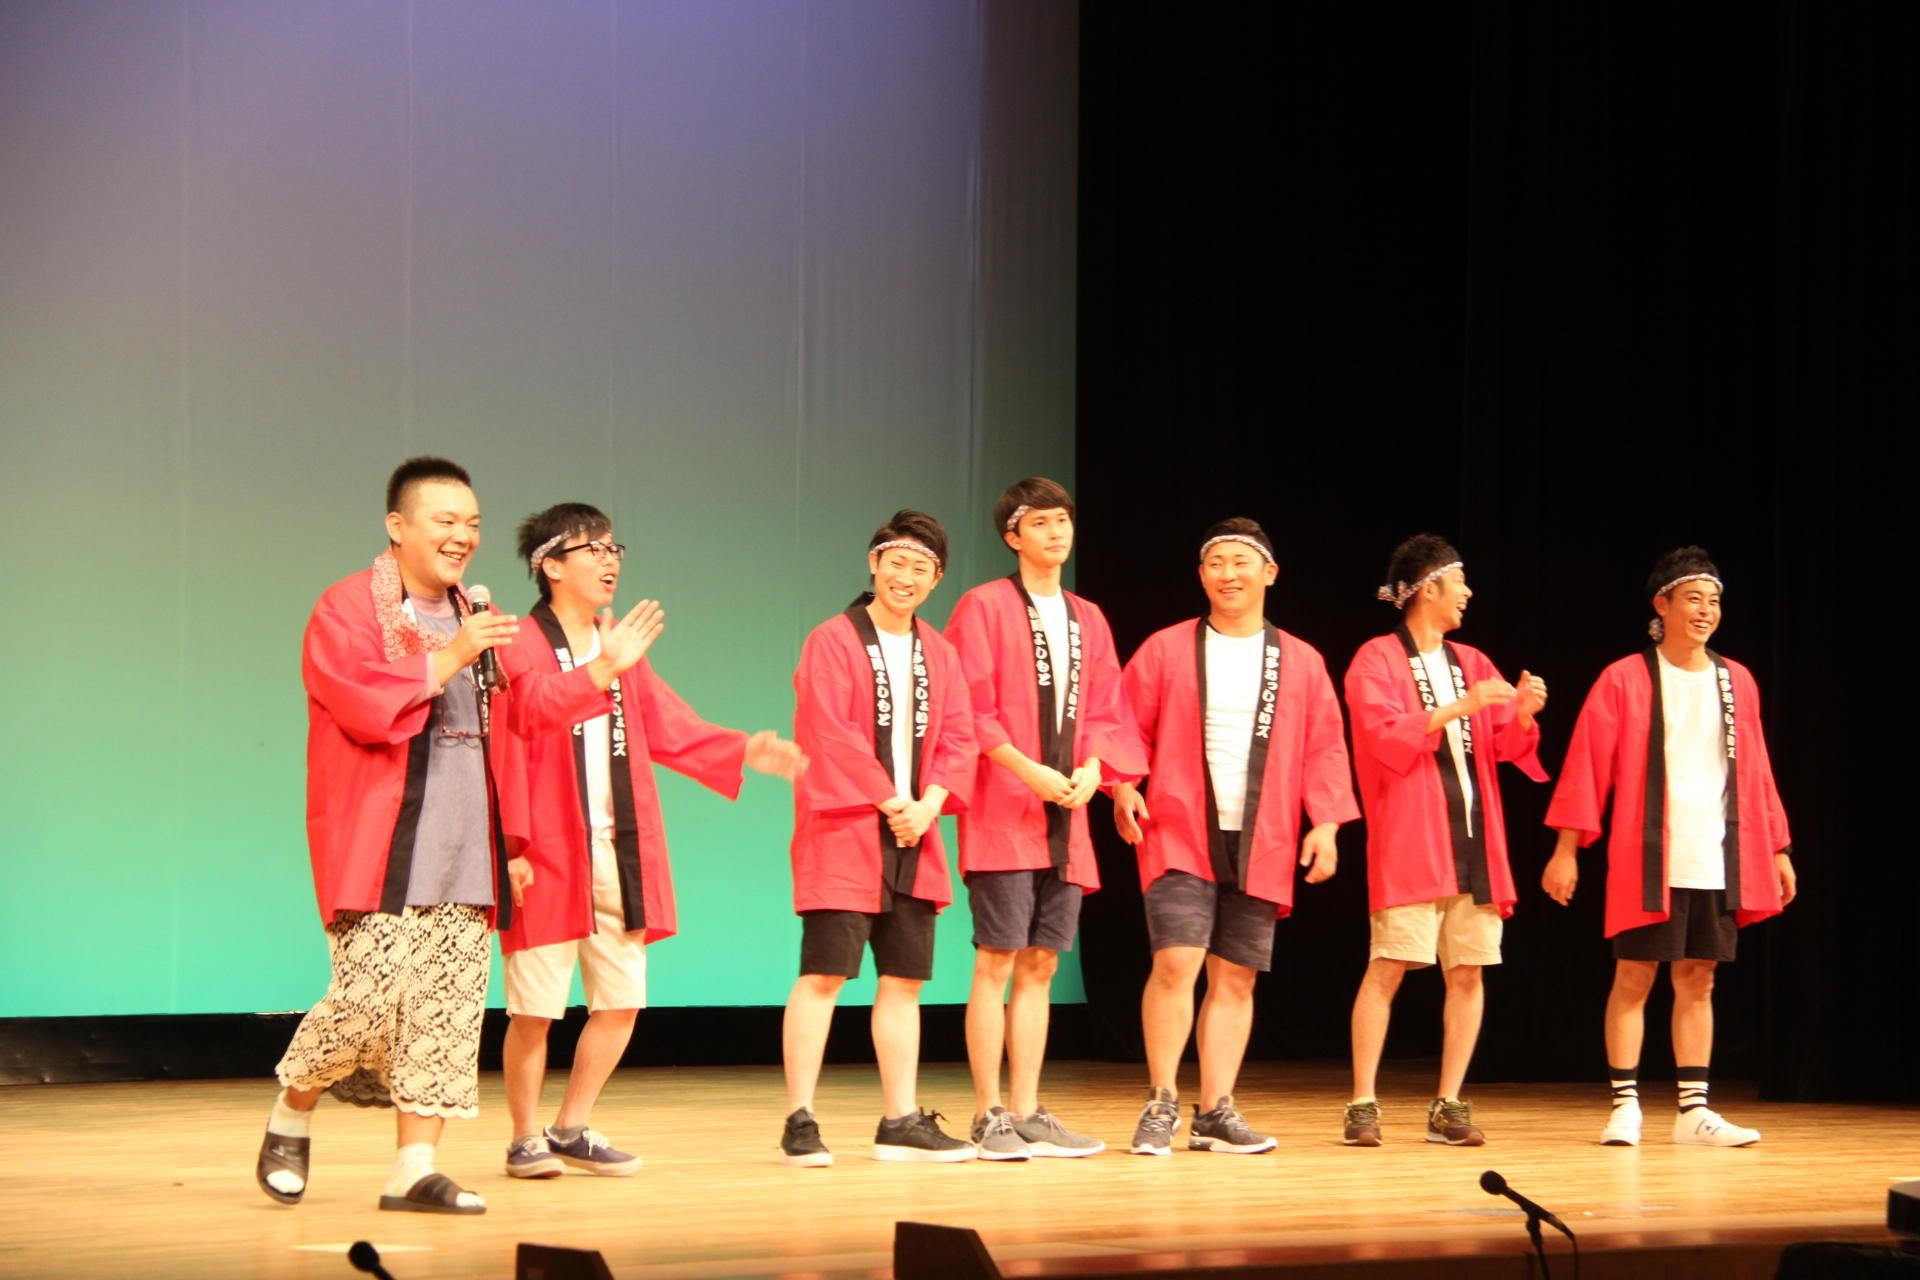 http://news.yoshimoto.co.jp/20180911111114-6340d886820feee742b619e047cd65a2953e4ae2.jpg